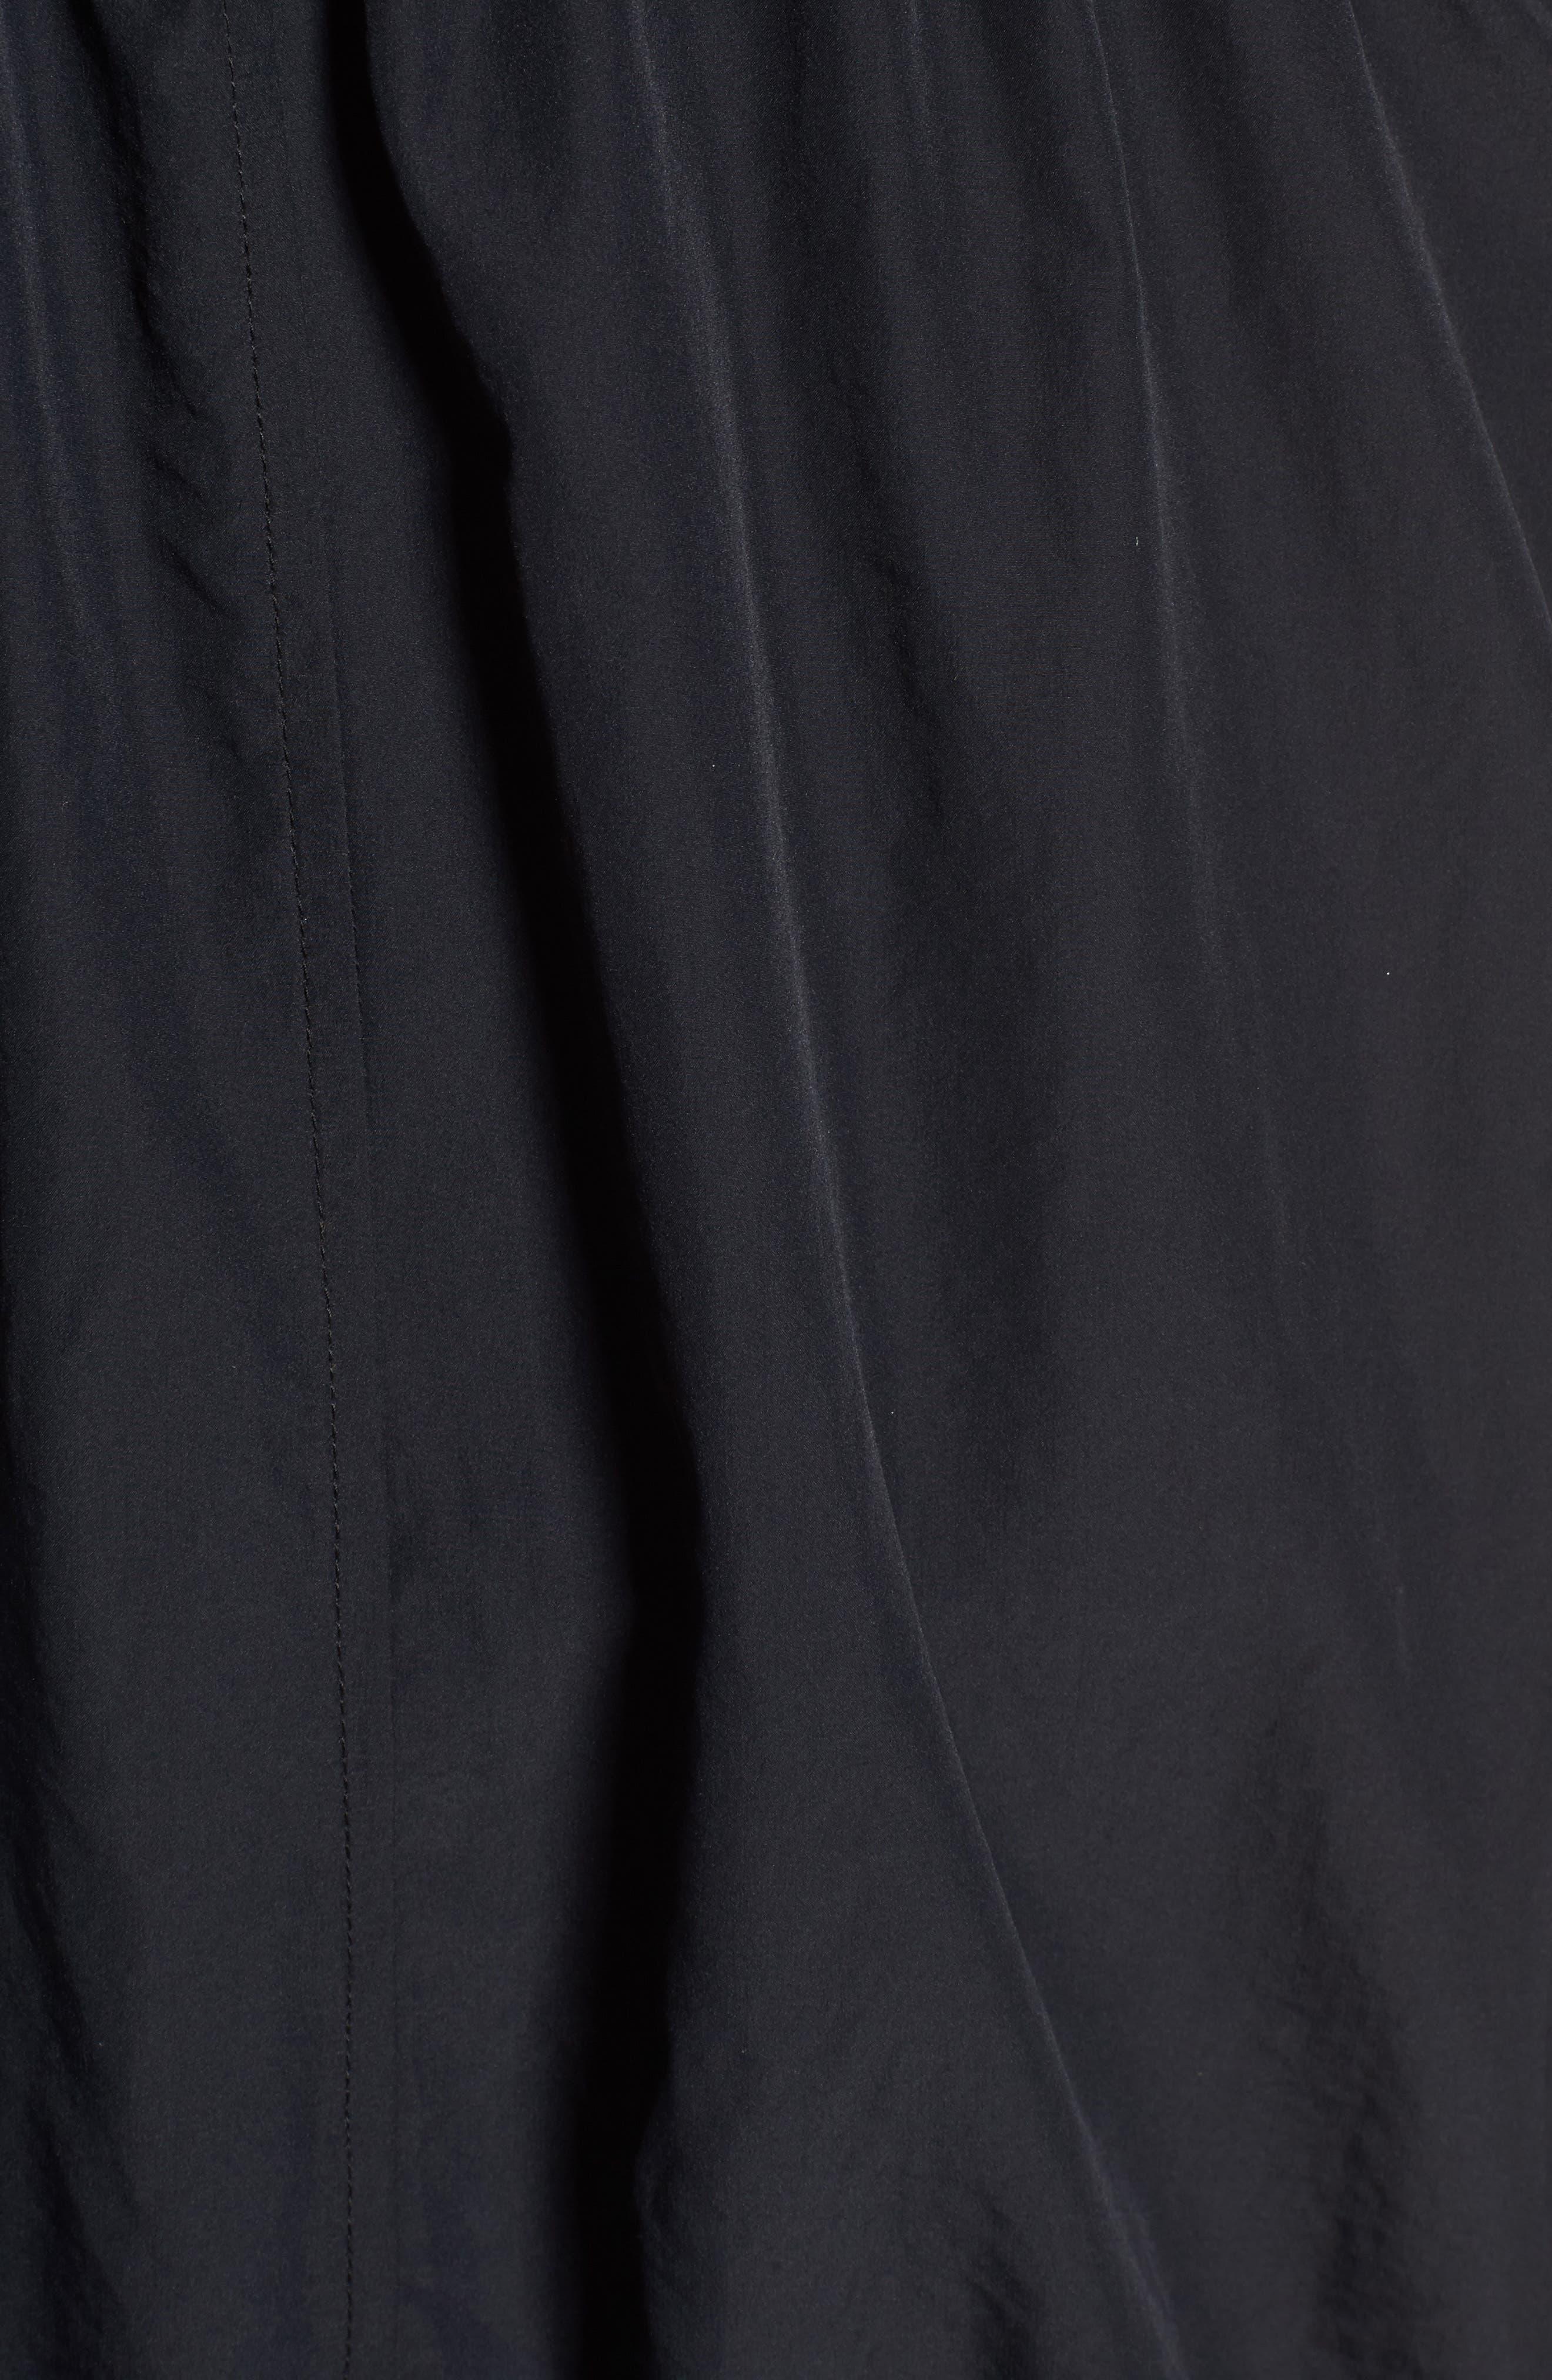 Tumbled Anorak Jacket,                             Alternate thumbnail 7, color,                             001